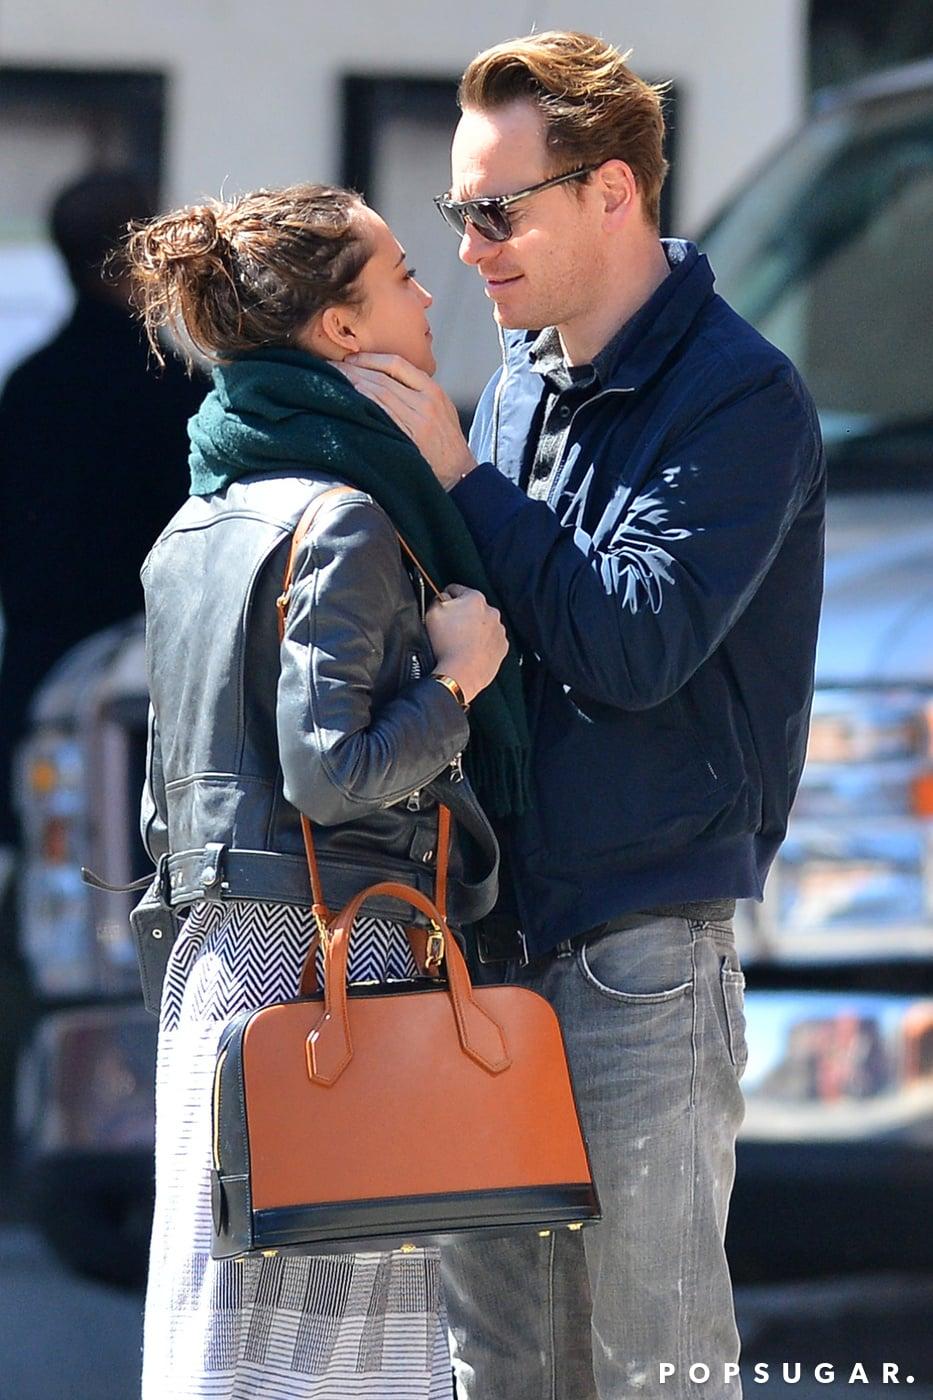 Michael Fassbender And Alicia Vikander Kissing In Nyc Popsugar Celebrity